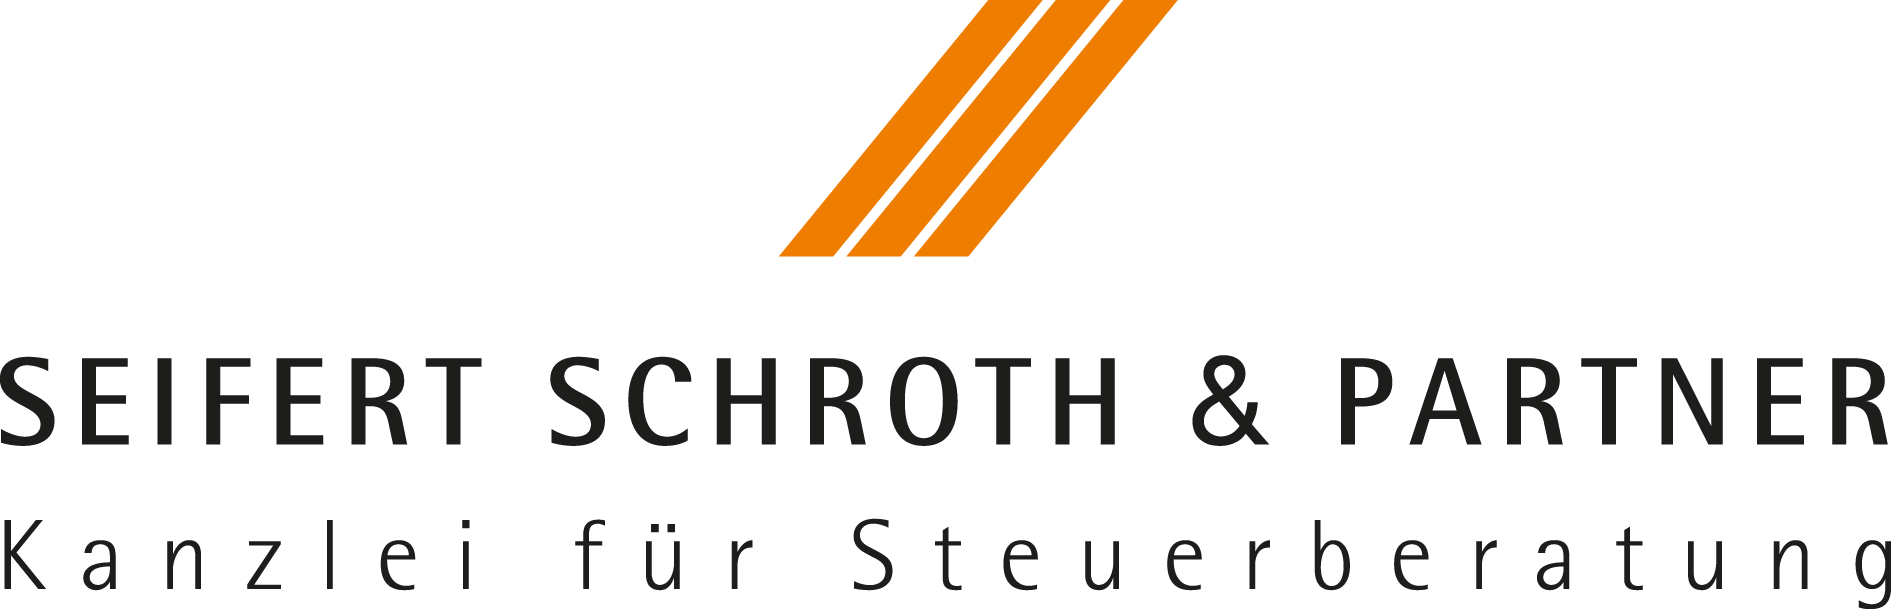 Seifert Schroth & Partner